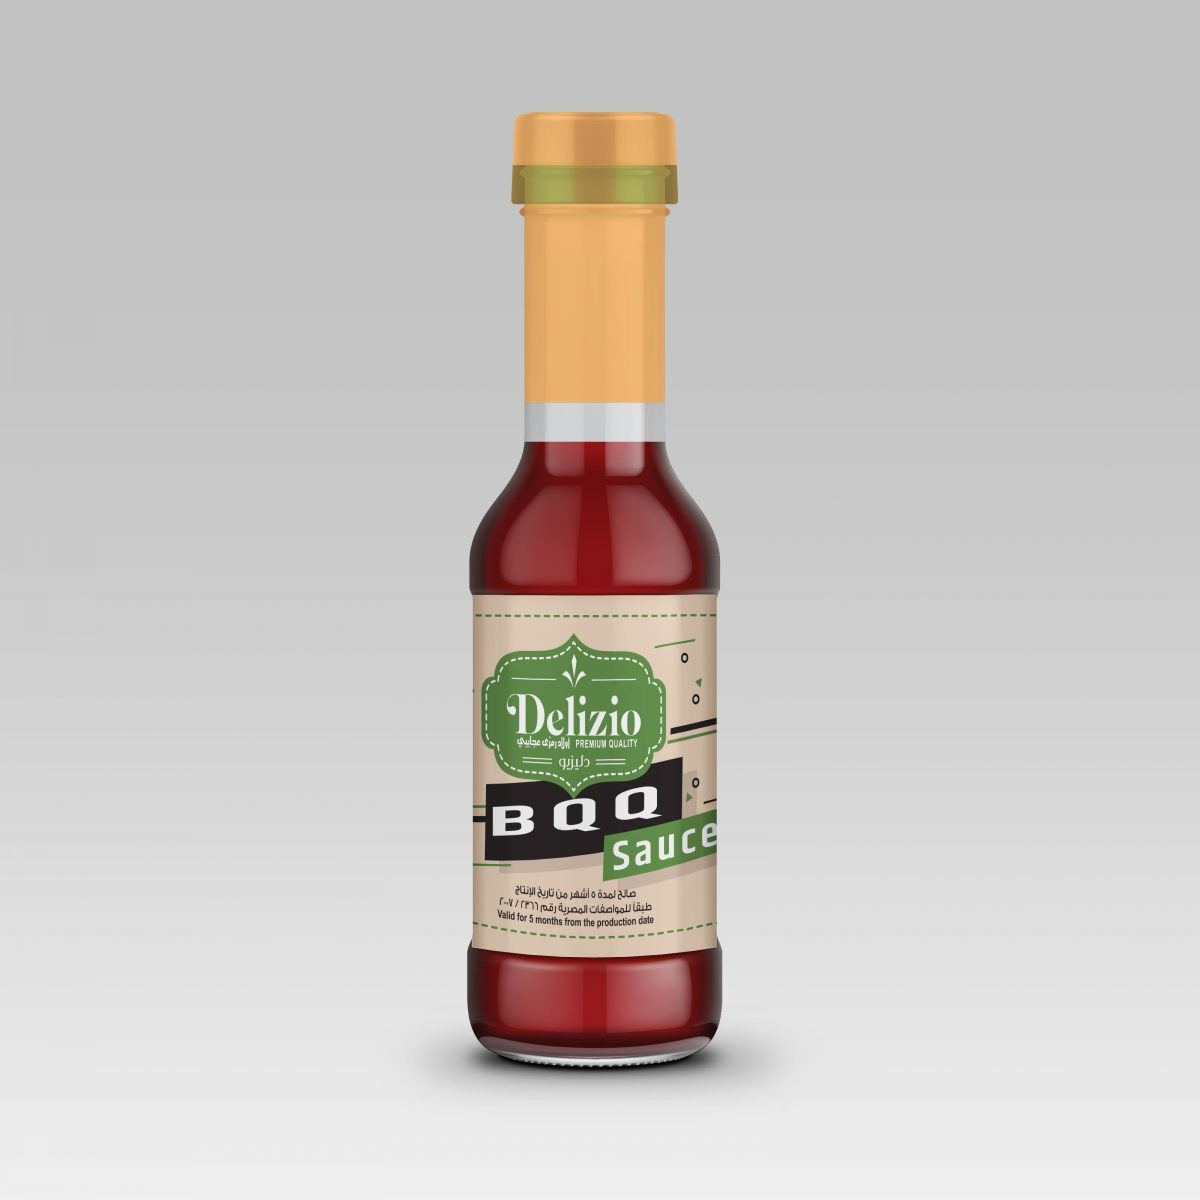 BQQ Sauce